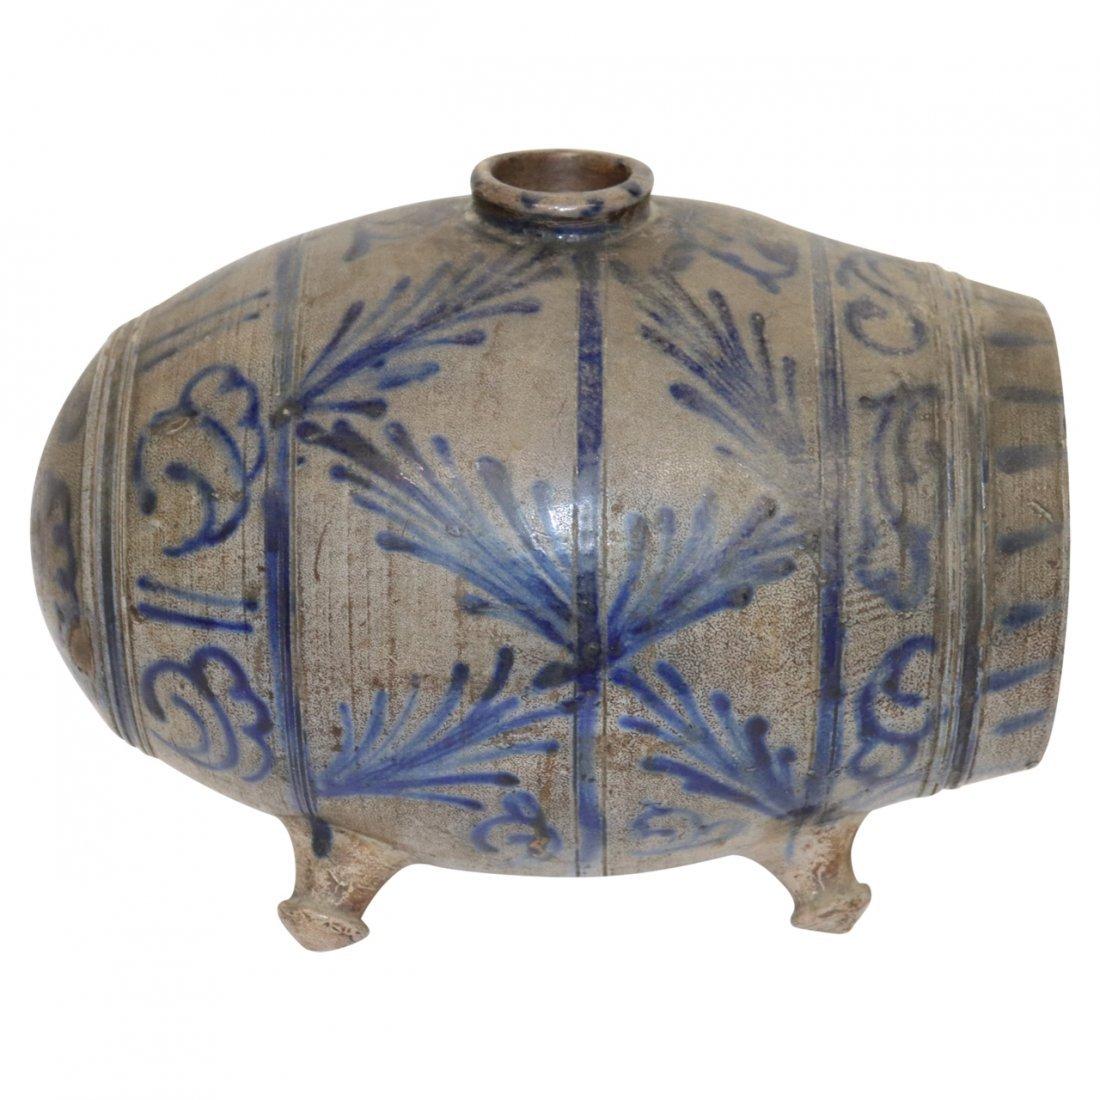 Stoneware Vessel Barrel Extensive Blue Decoeration